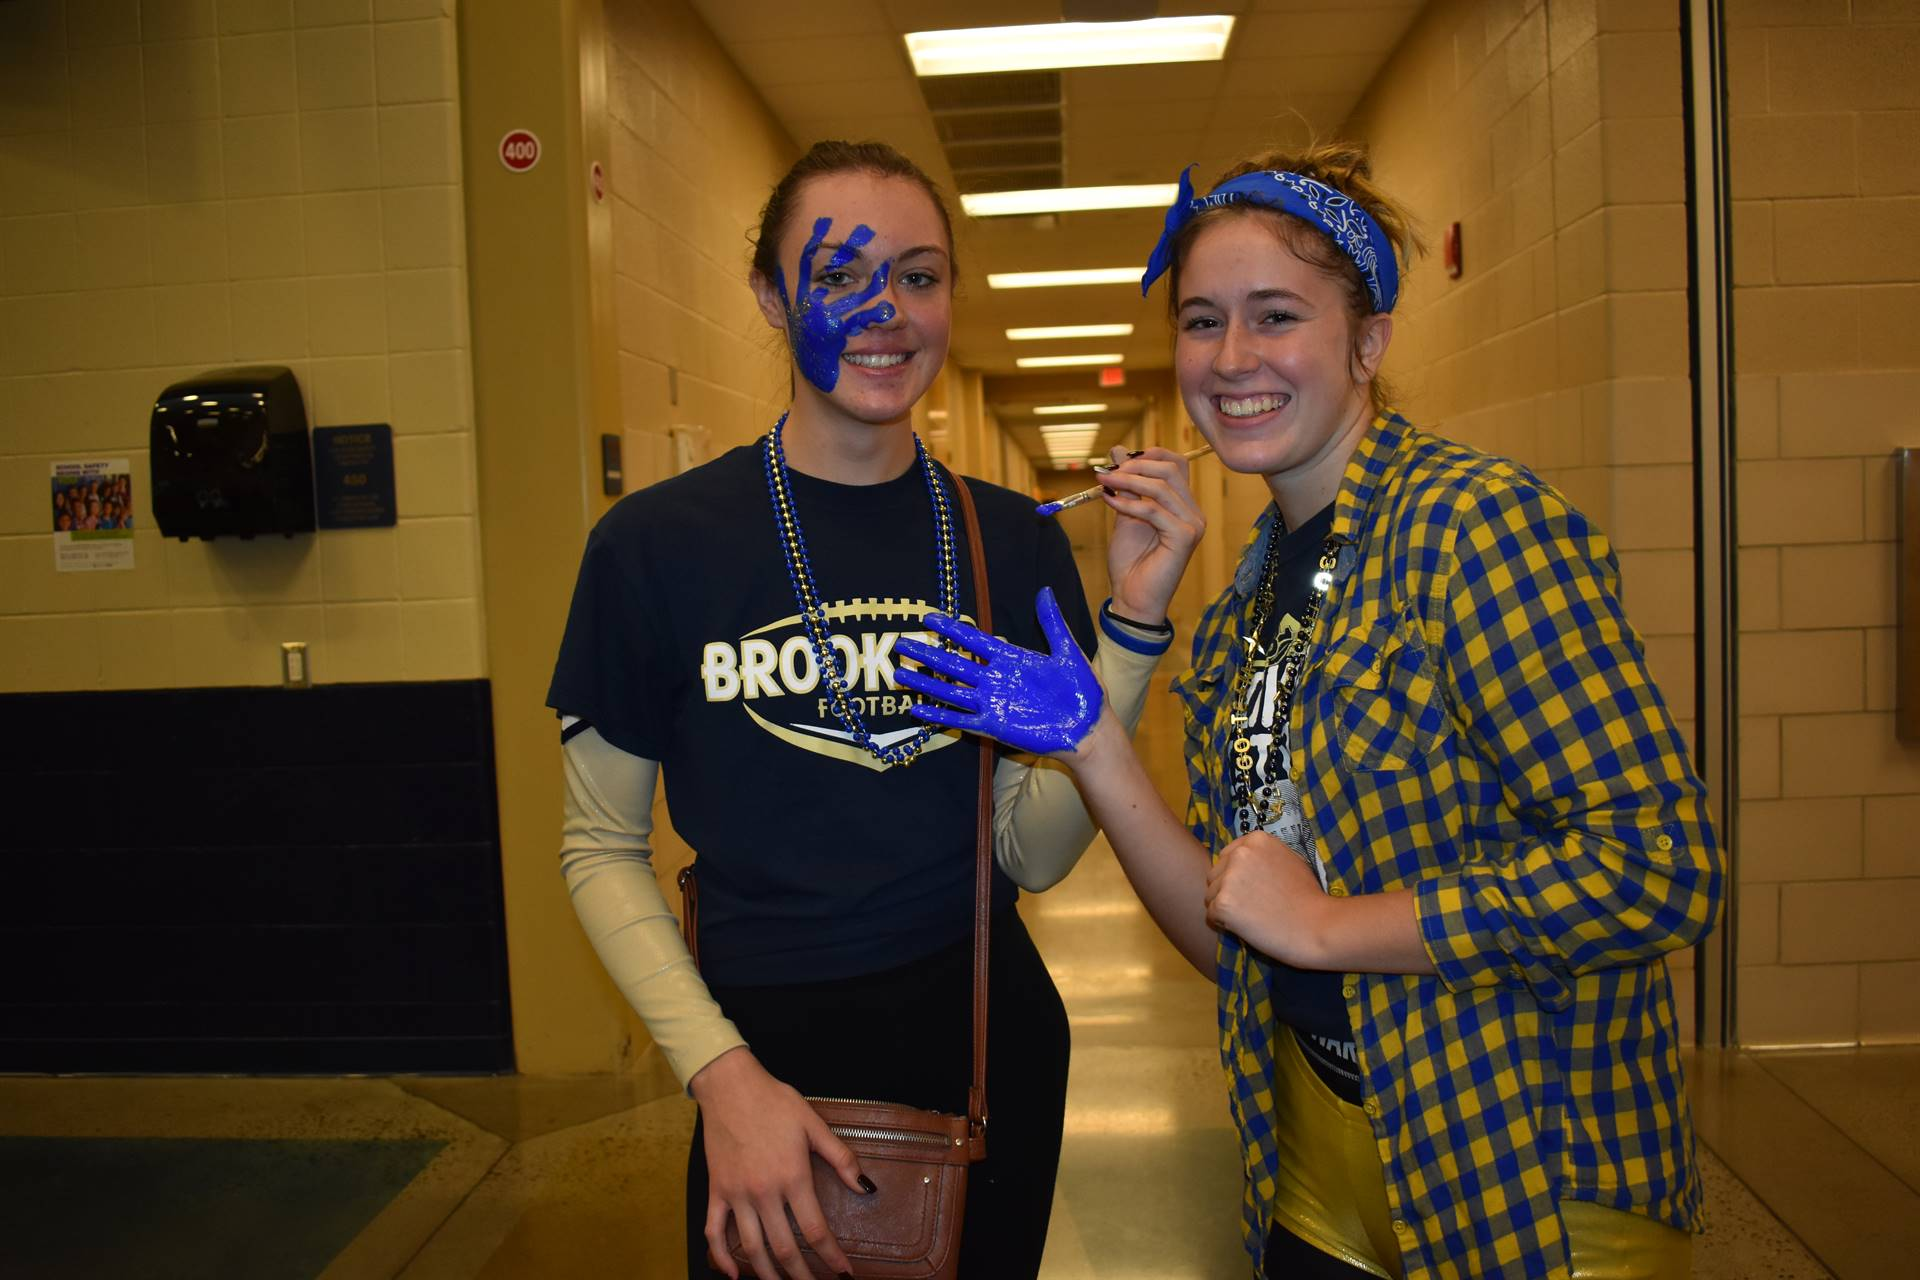 Brookfield High School Spirit Week